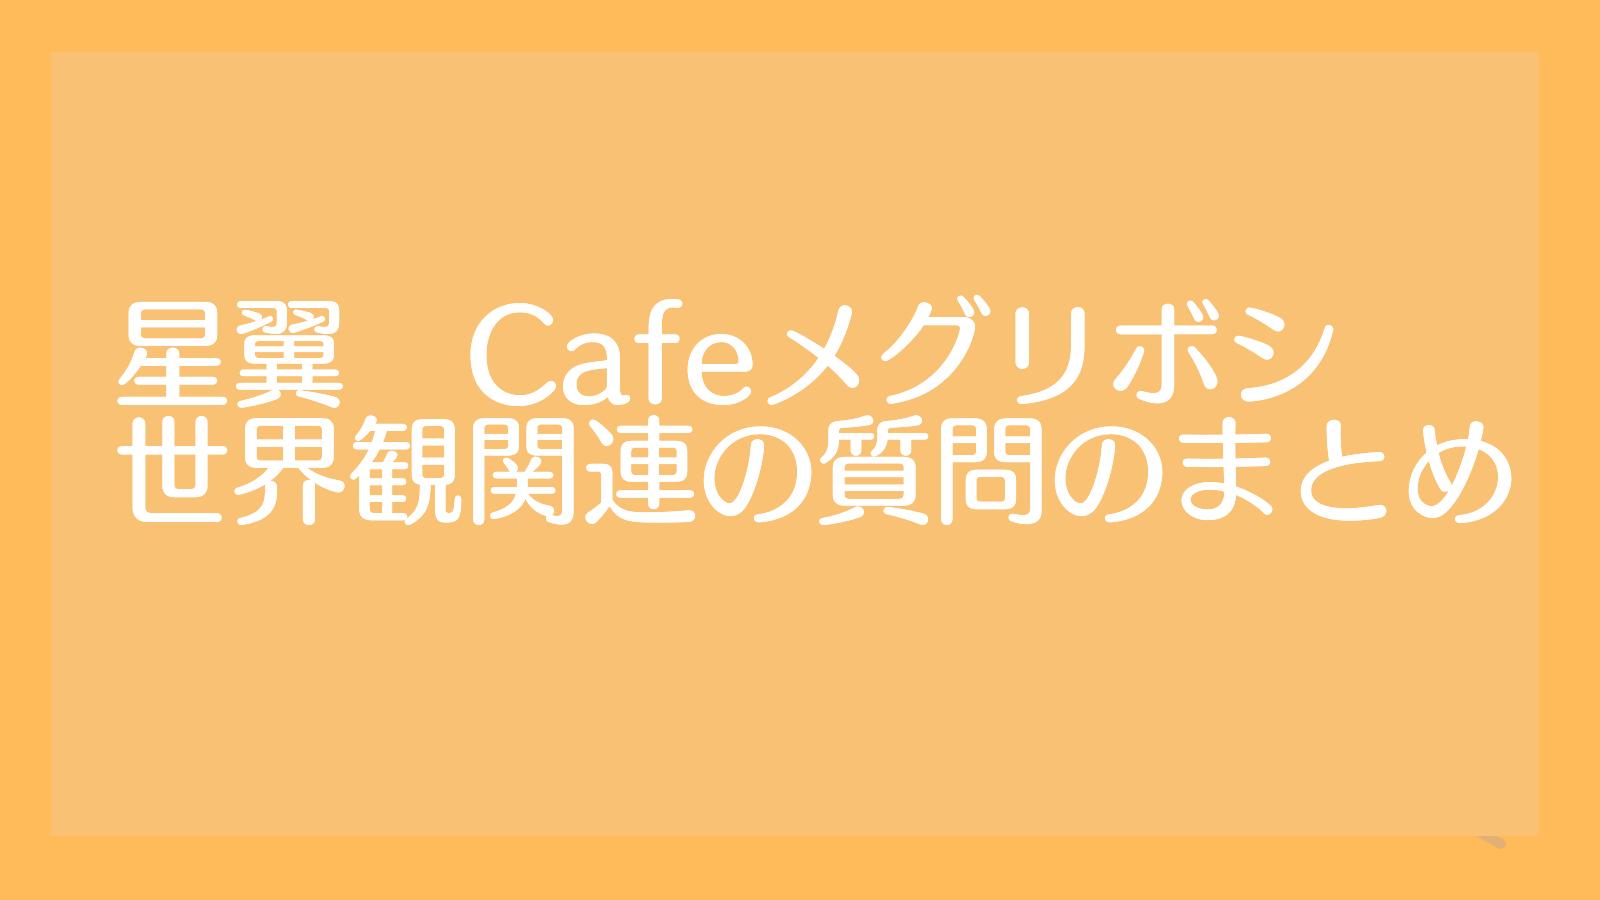 Cafeメグリボシ配信ちょっとまとめ